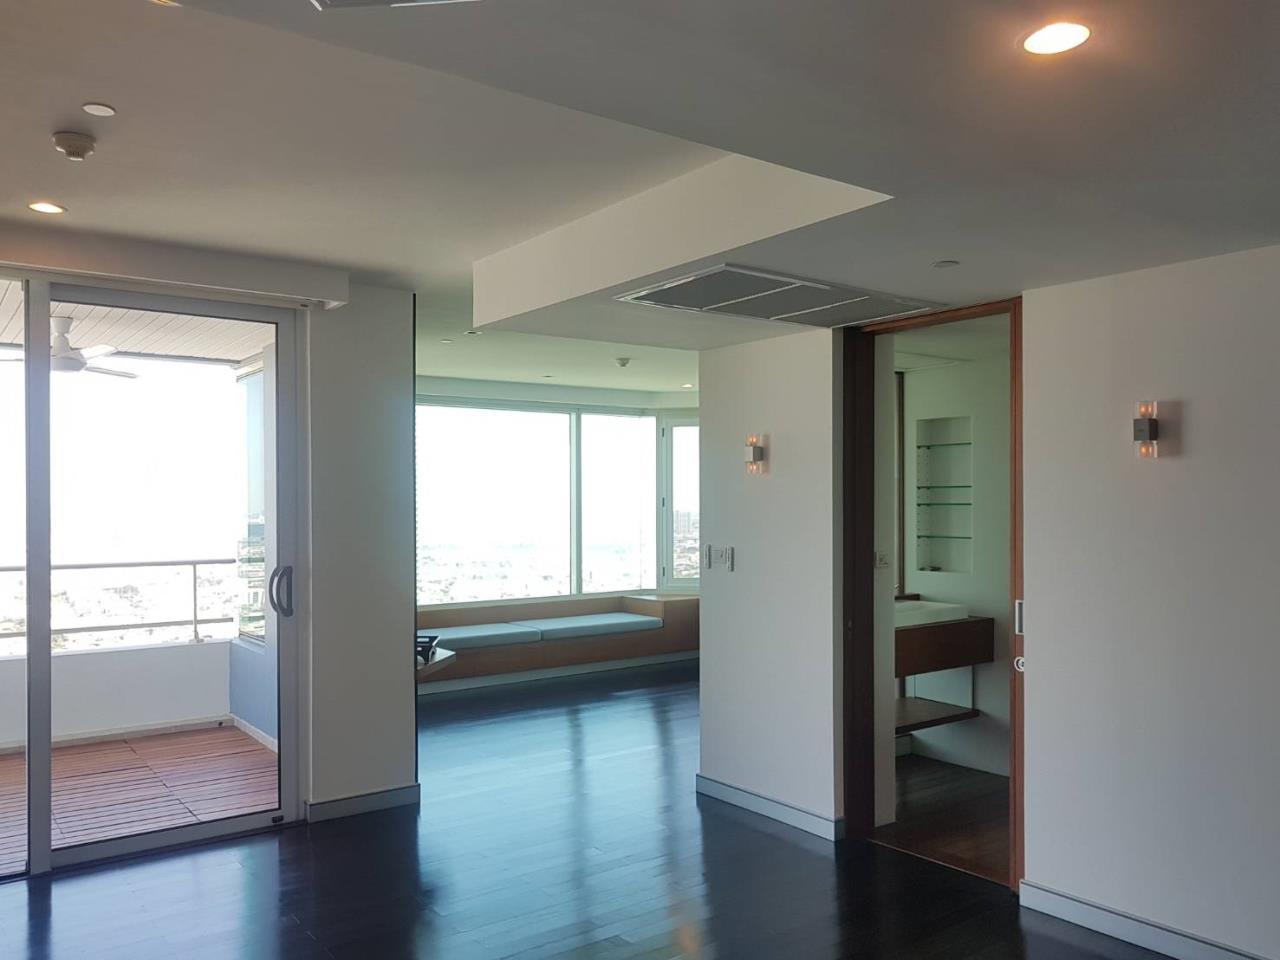 SALA ESTATE Agency's WATERMARK CHAOPHRAYA RIVER – RIVERSIDE-NEAR ICON SIAM,豪华公寓,河景房, 4+1卧5卫,家具齐全 3